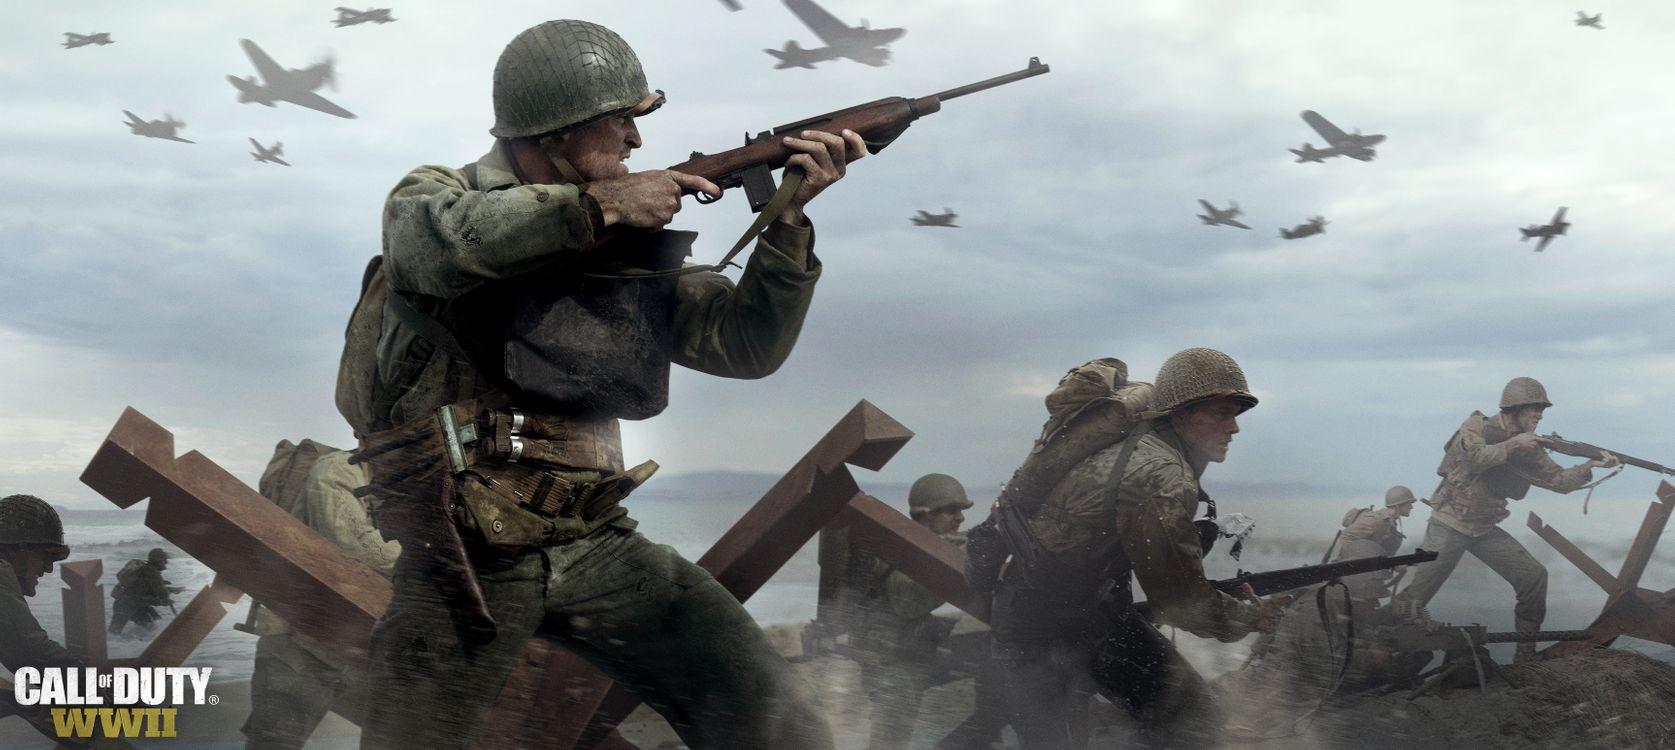 Фото бесплатно Call Of Duty Wwii, Call Of Duty Ww2, чувство долга - на рабочий стол